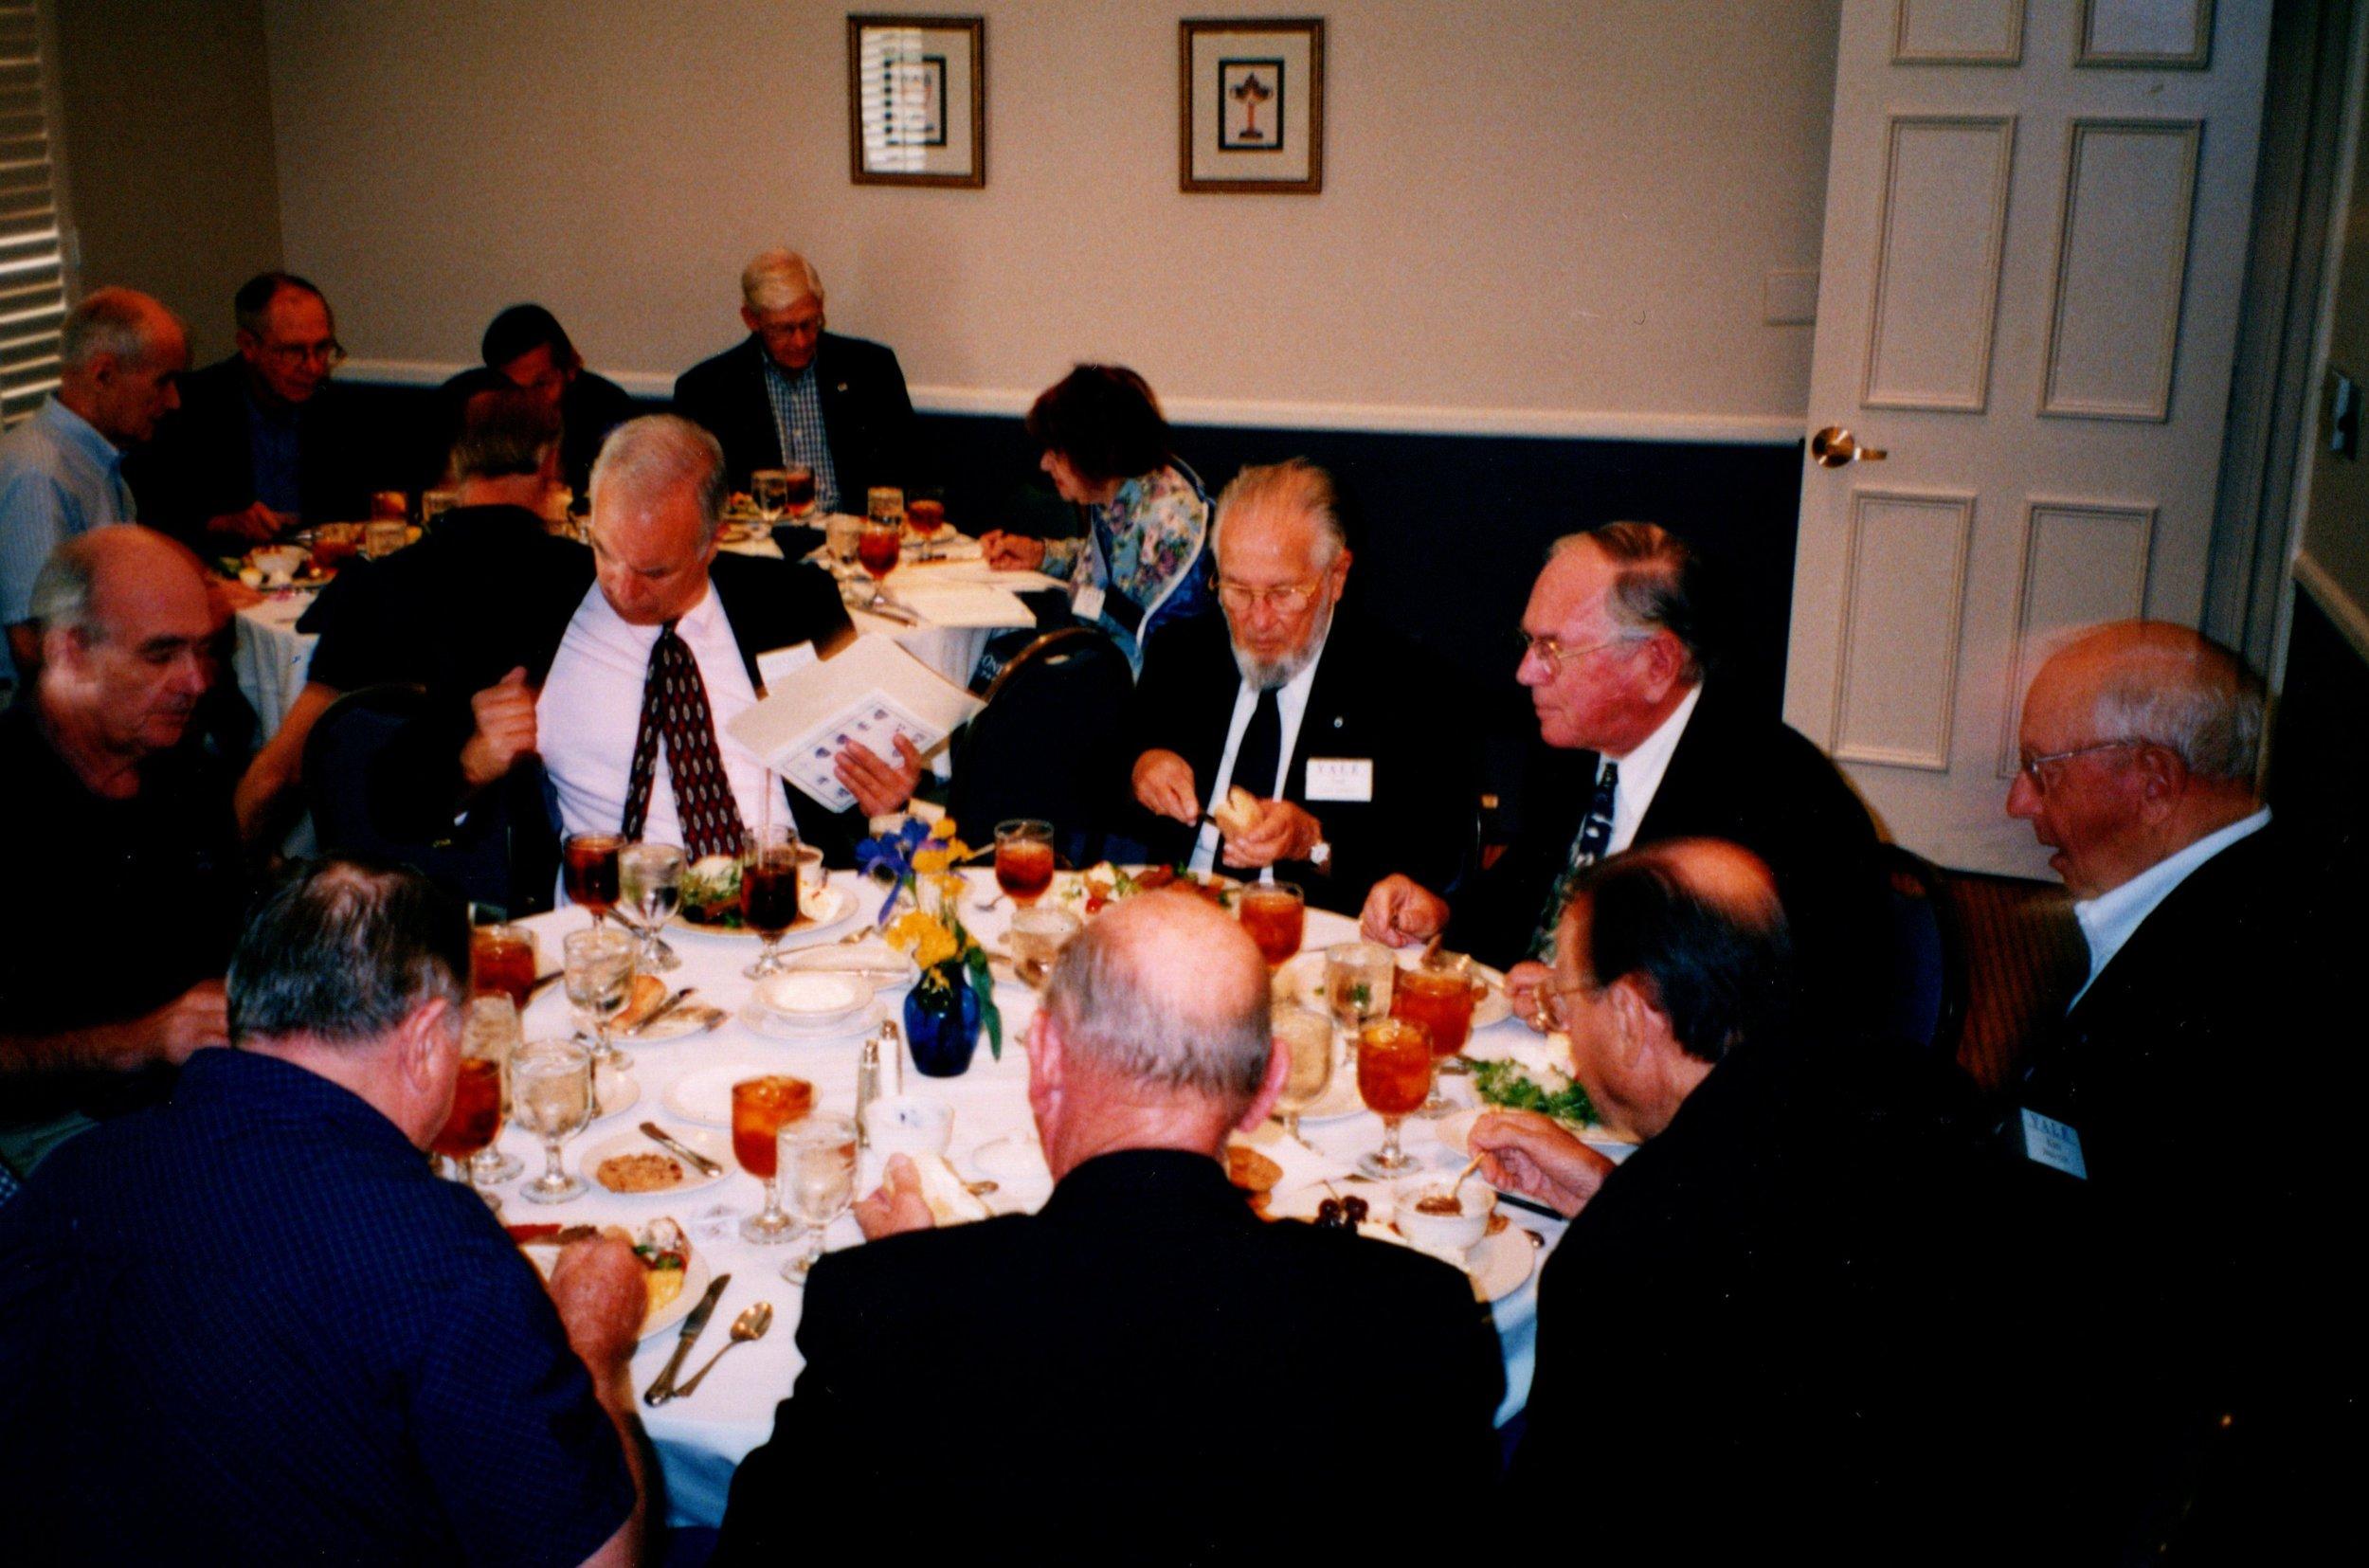 4_8_2004 - SEMI-ANNUAL TRUSTEES MEETING - COLLIER ATHLETIC CLUB  1.jpg